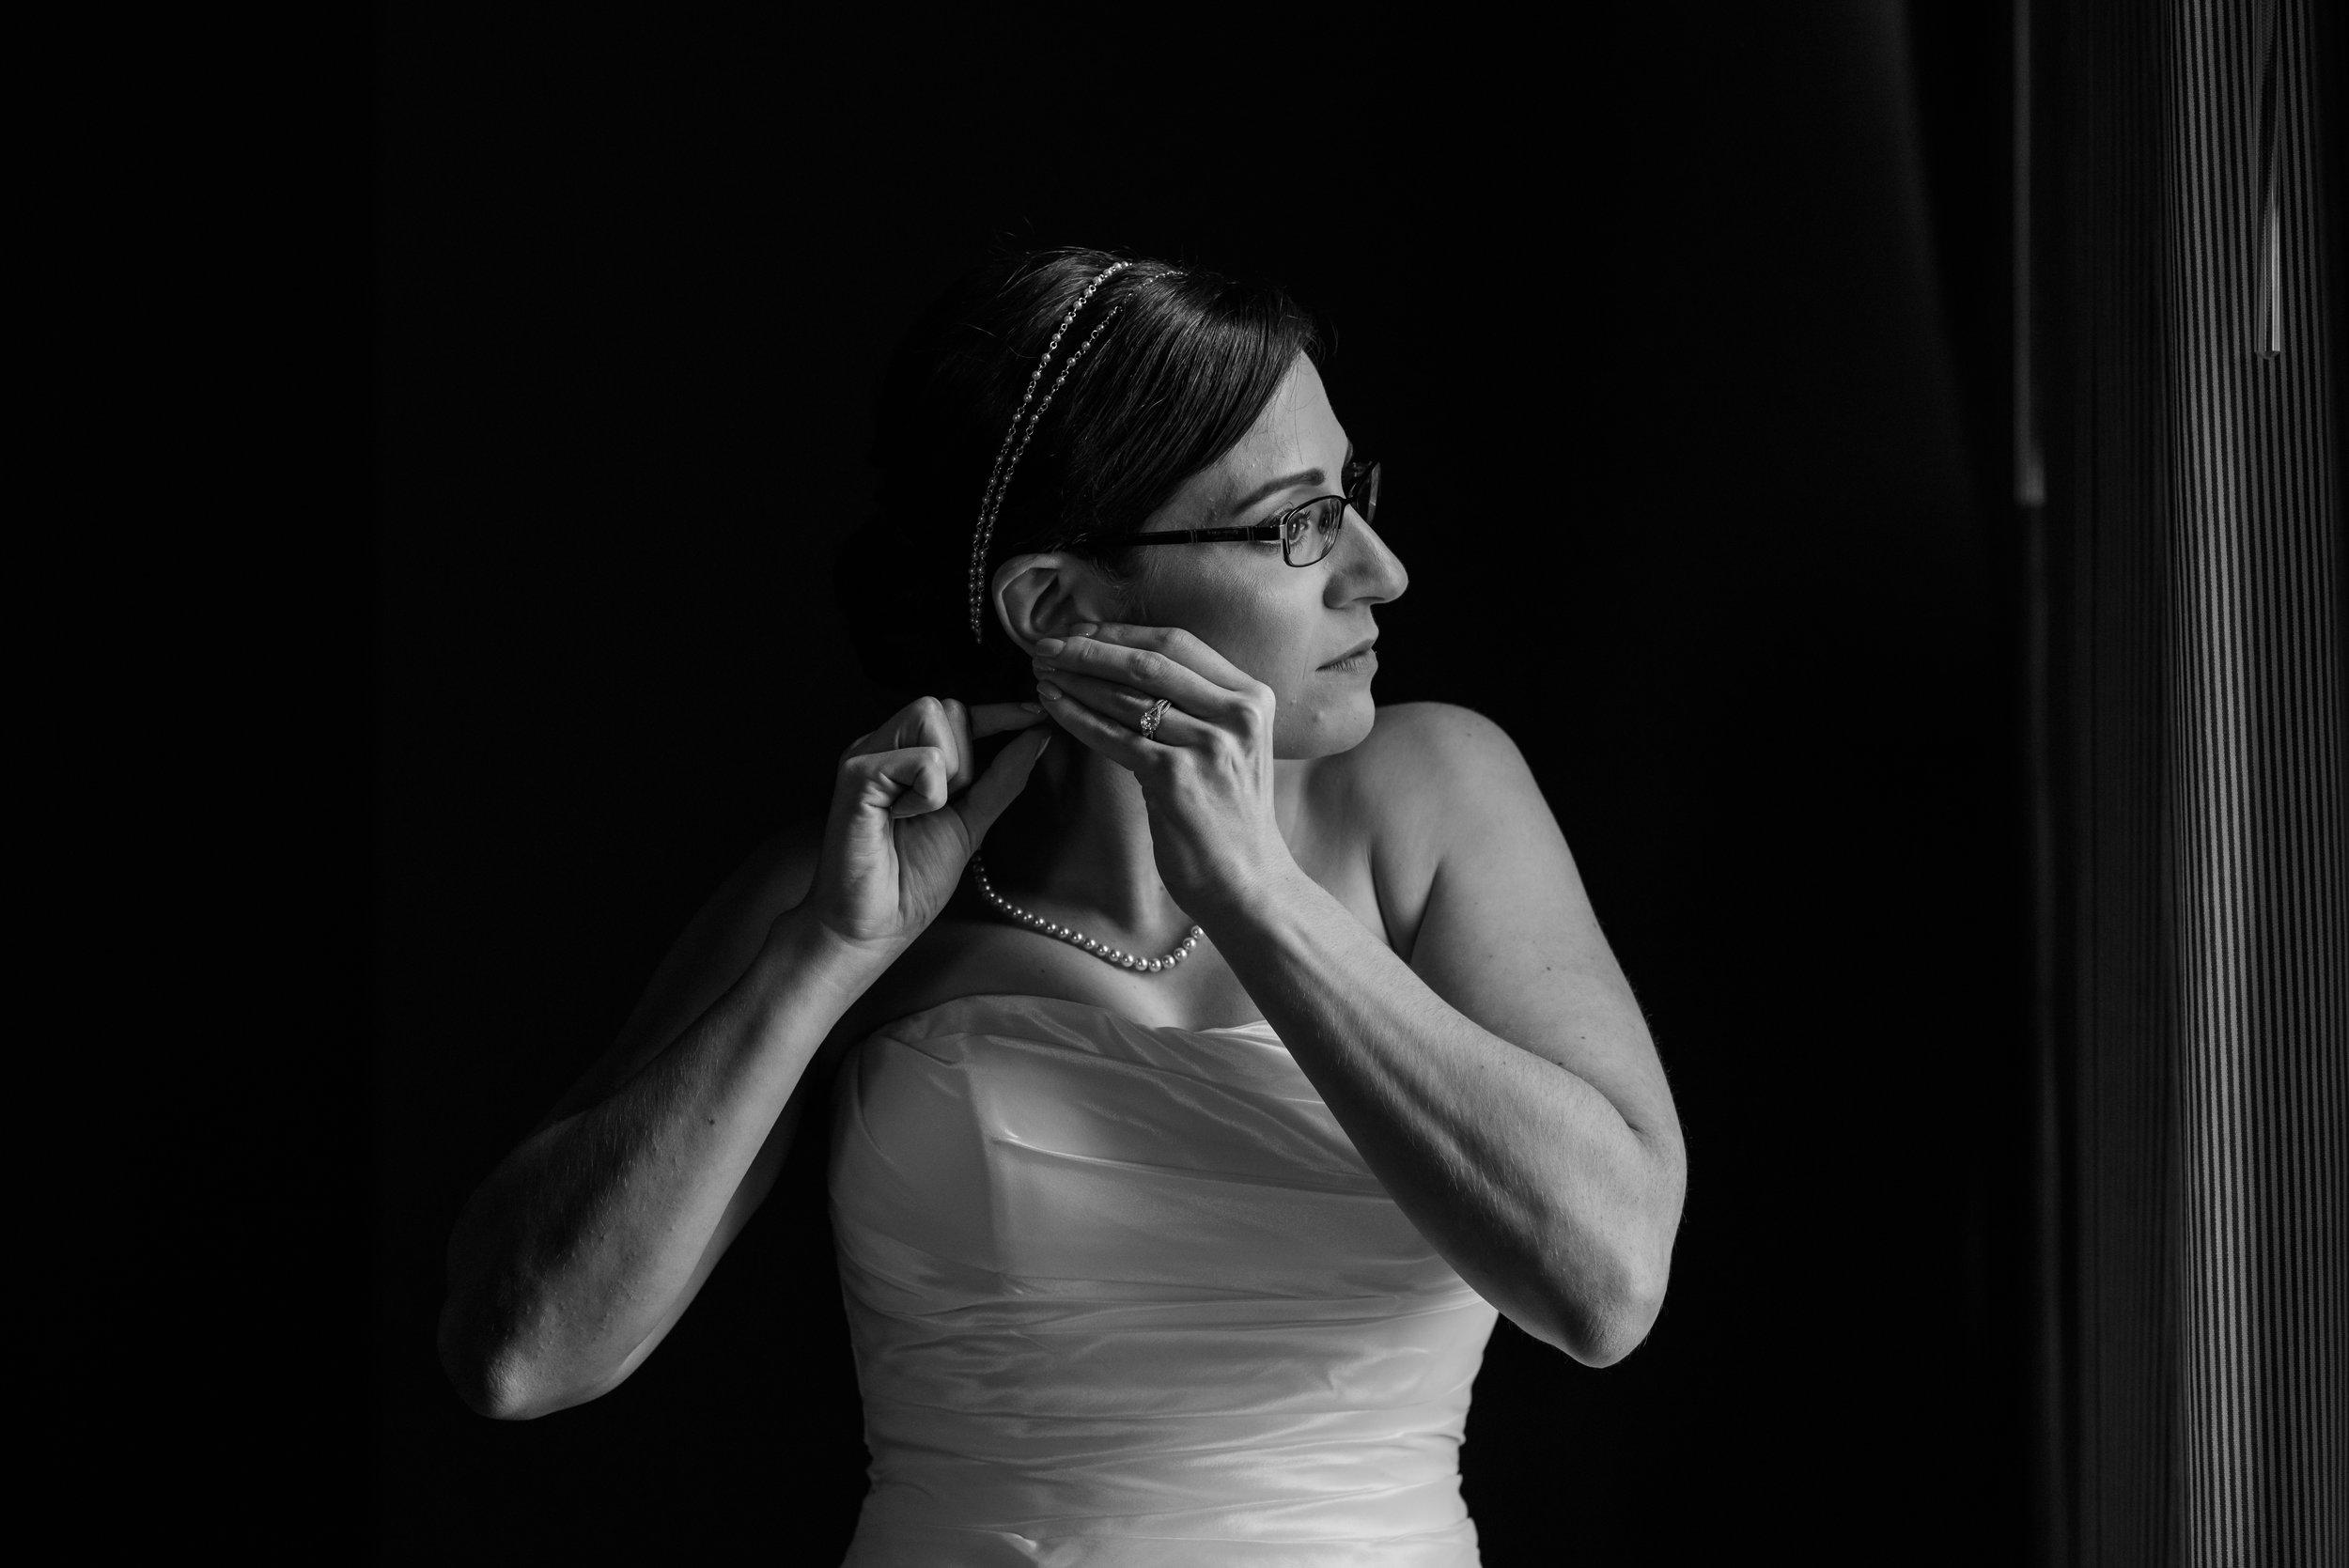 judith-john-007-citizen-hotel-sacramento-wedding-photographer-katherine-nicole-photography.JPG